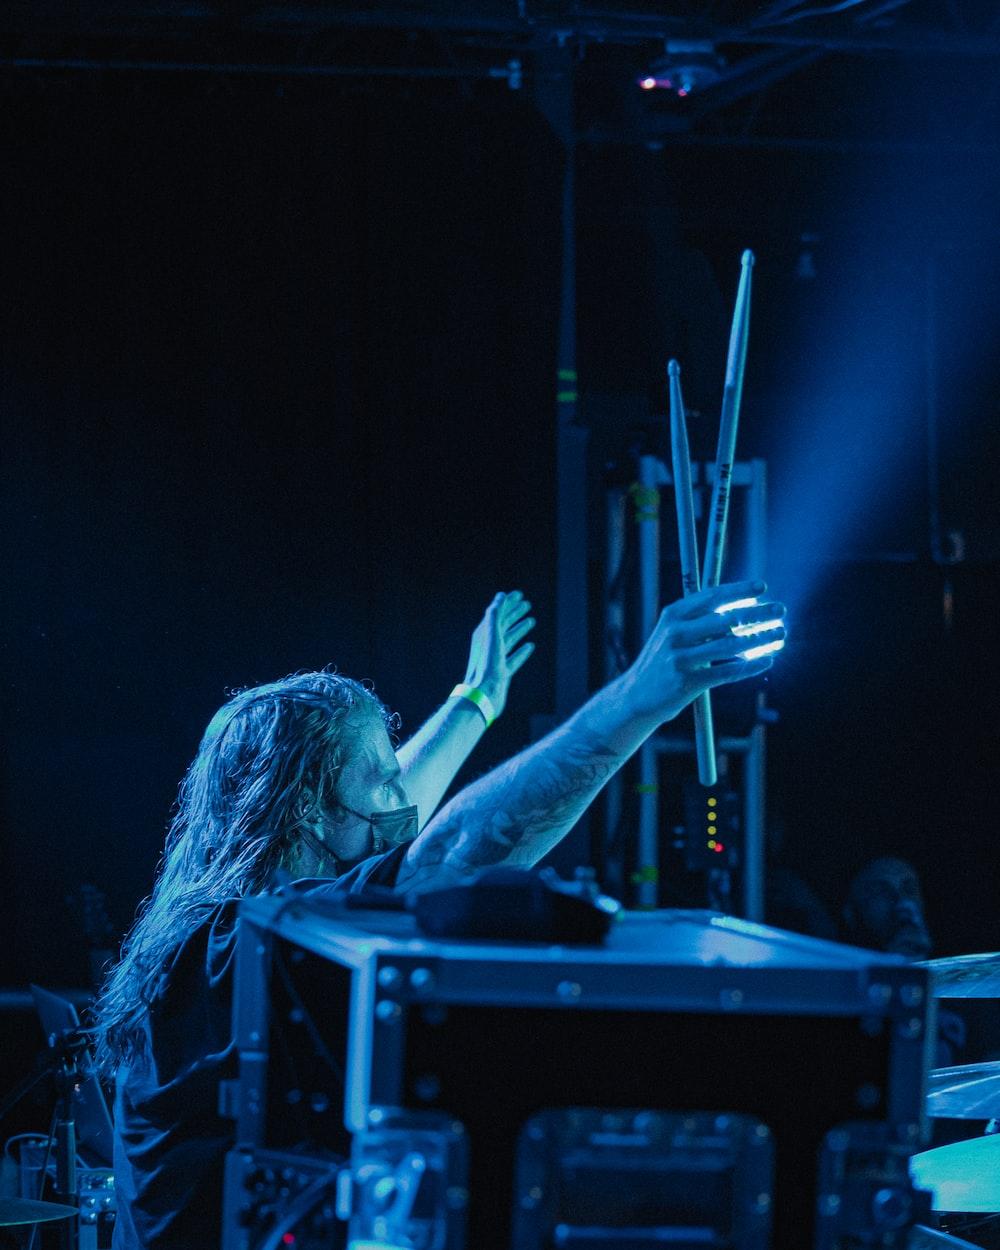 woman in black shirt raising her right hand